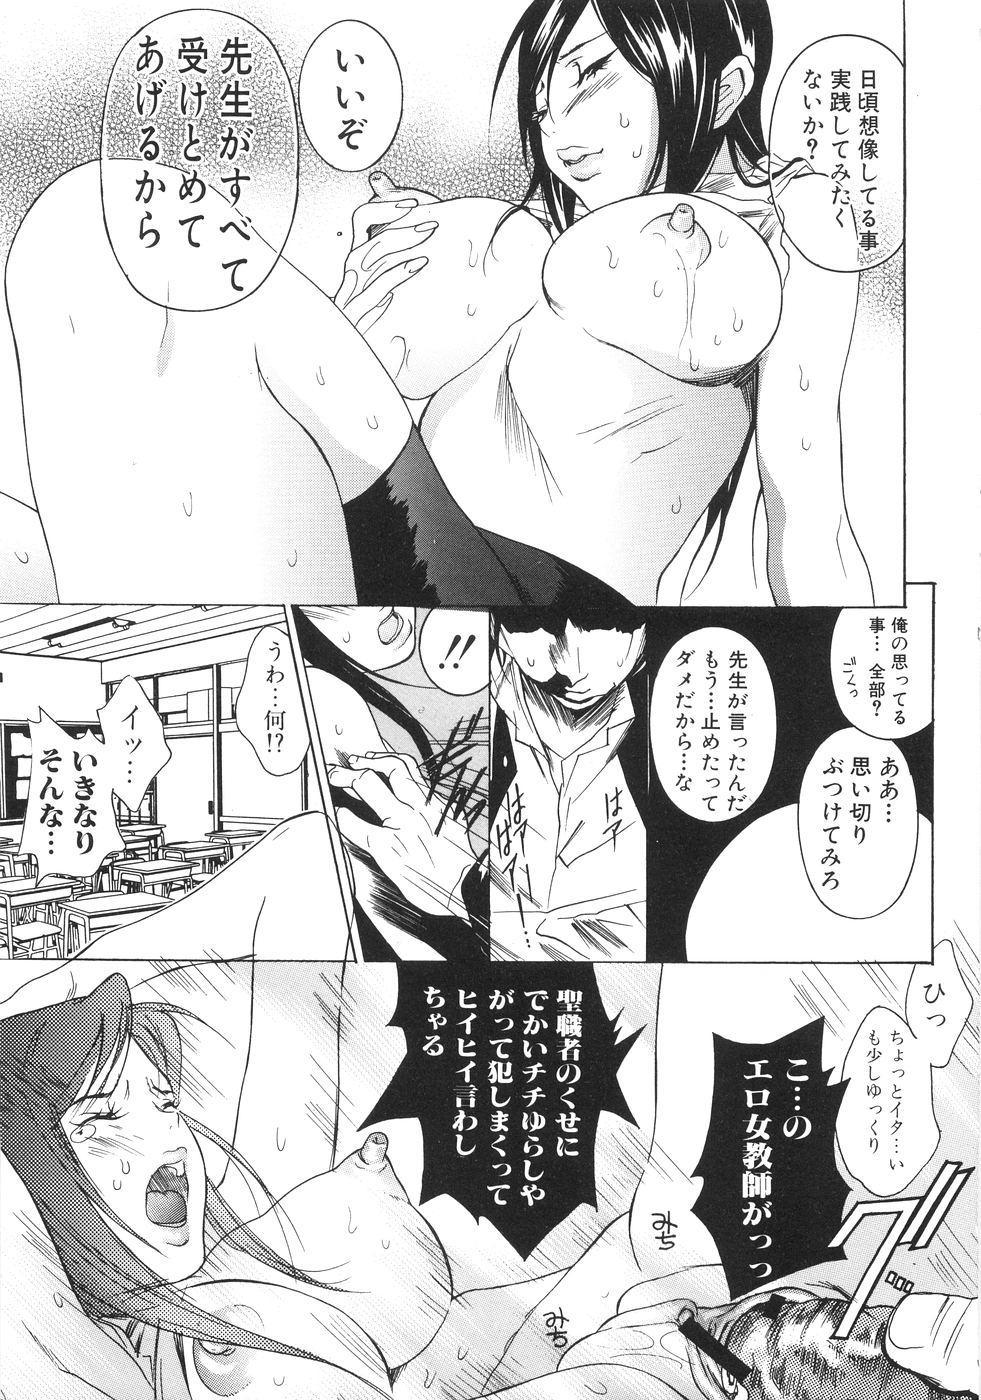 Honki Jiru - Cowper's Gland Liquid? or Love Juice?...?! 11